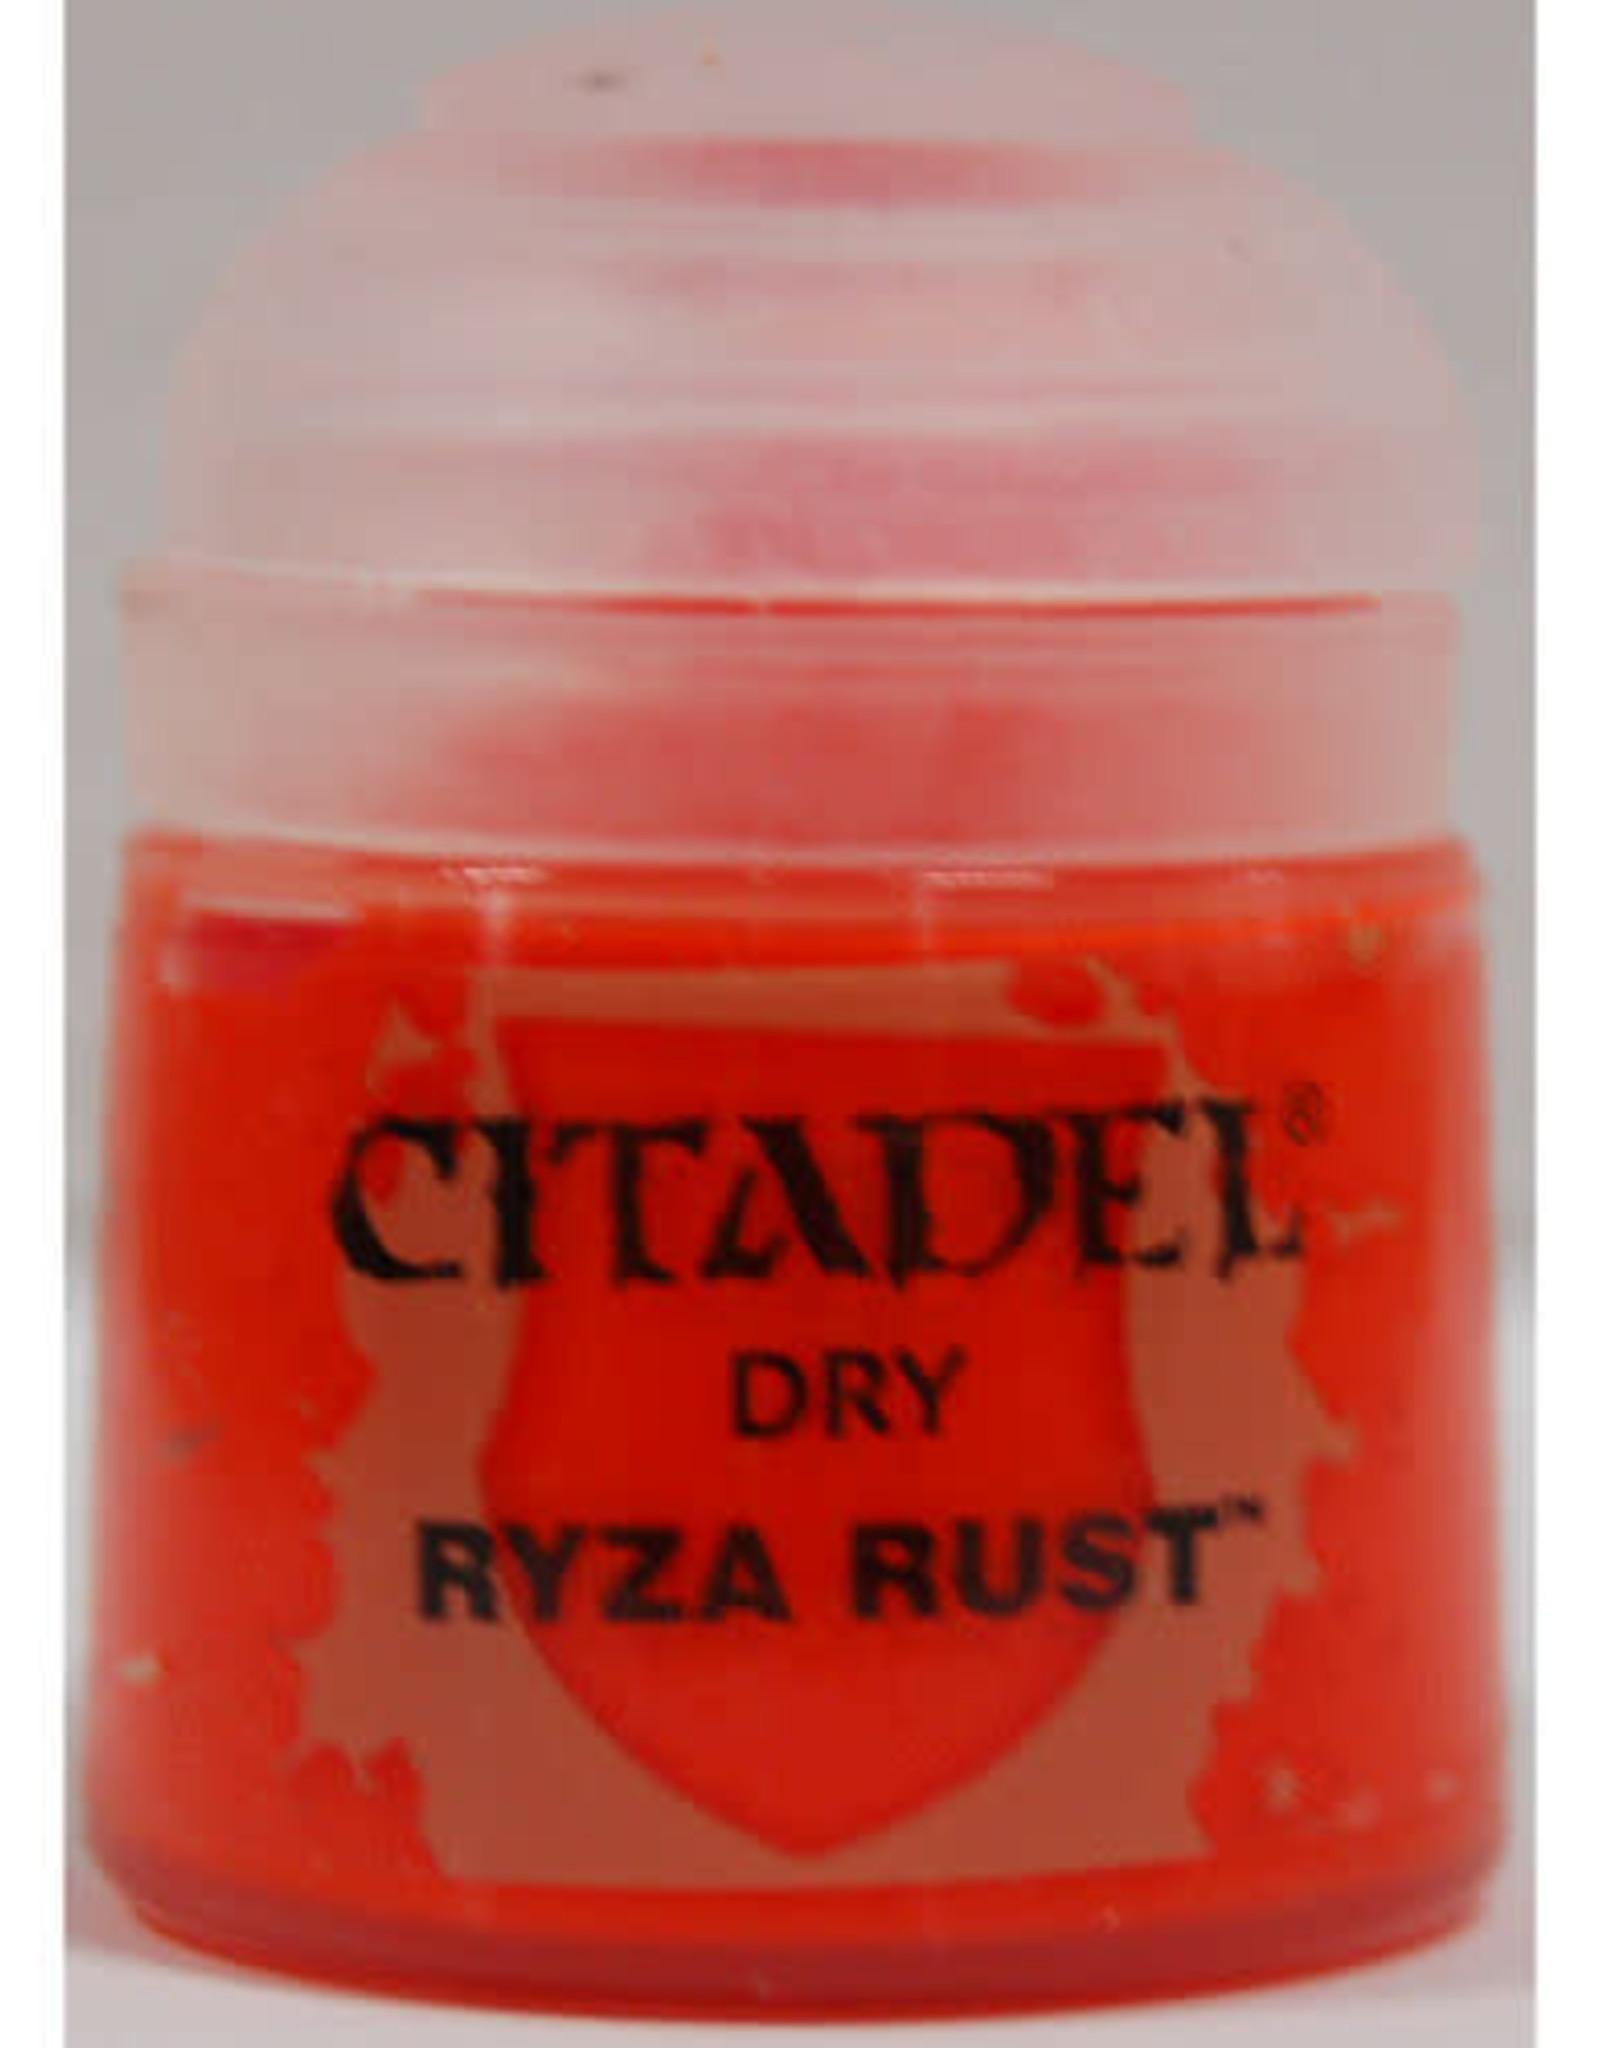 Citadel Dry Paint: Ryza Rust (12ml)